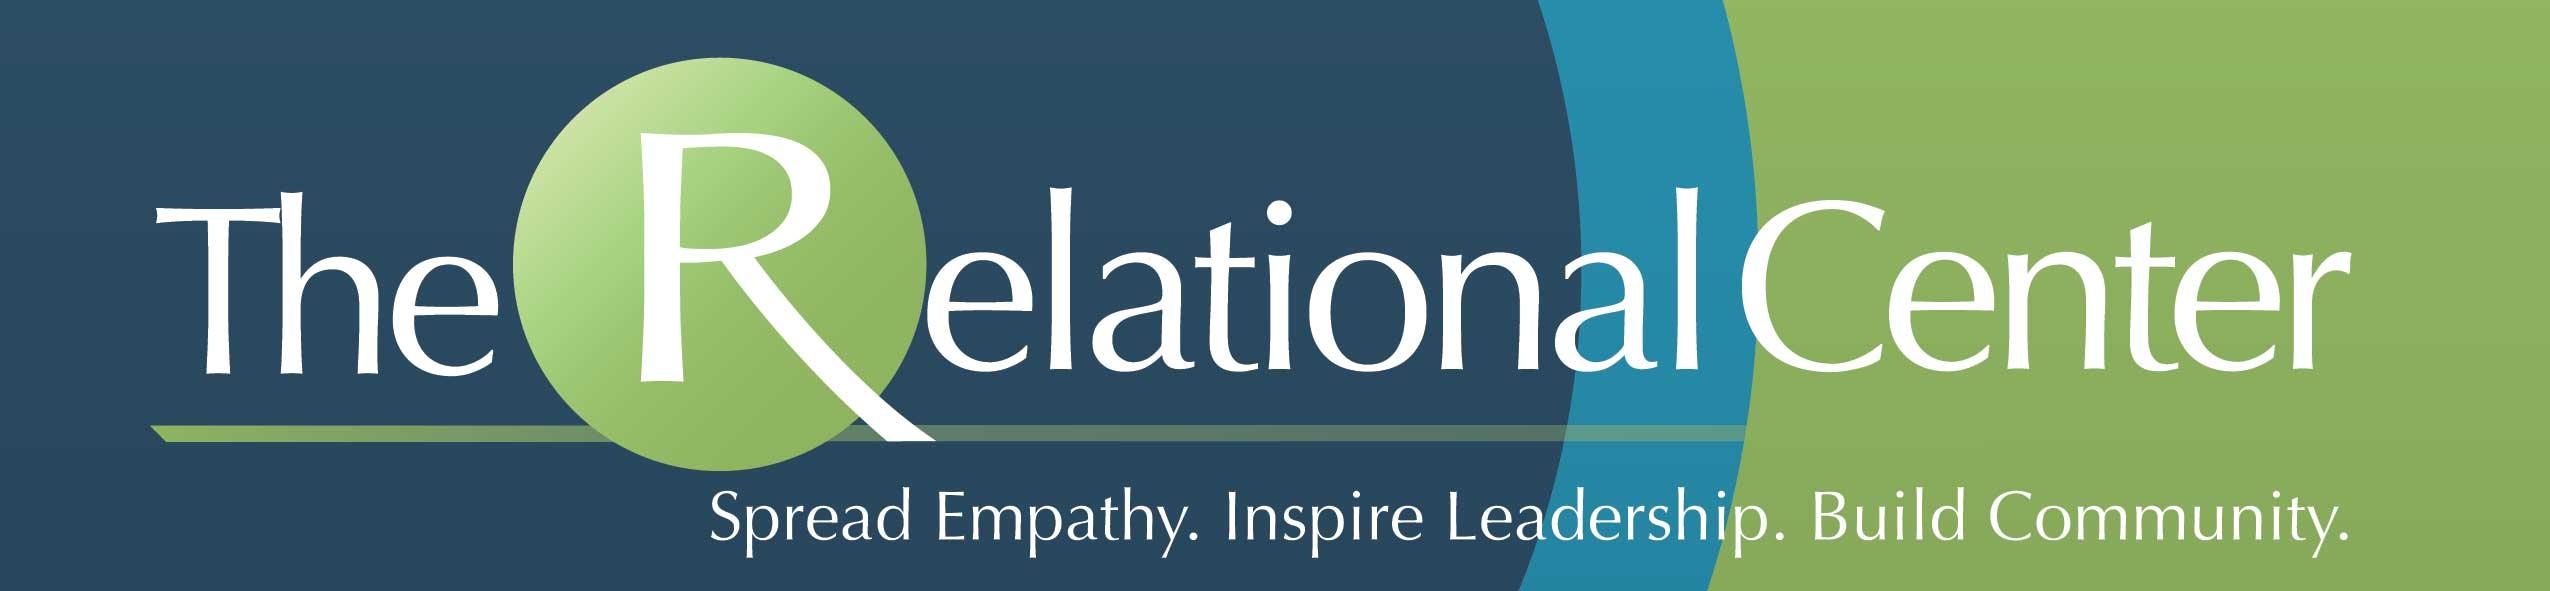 The Relational Center